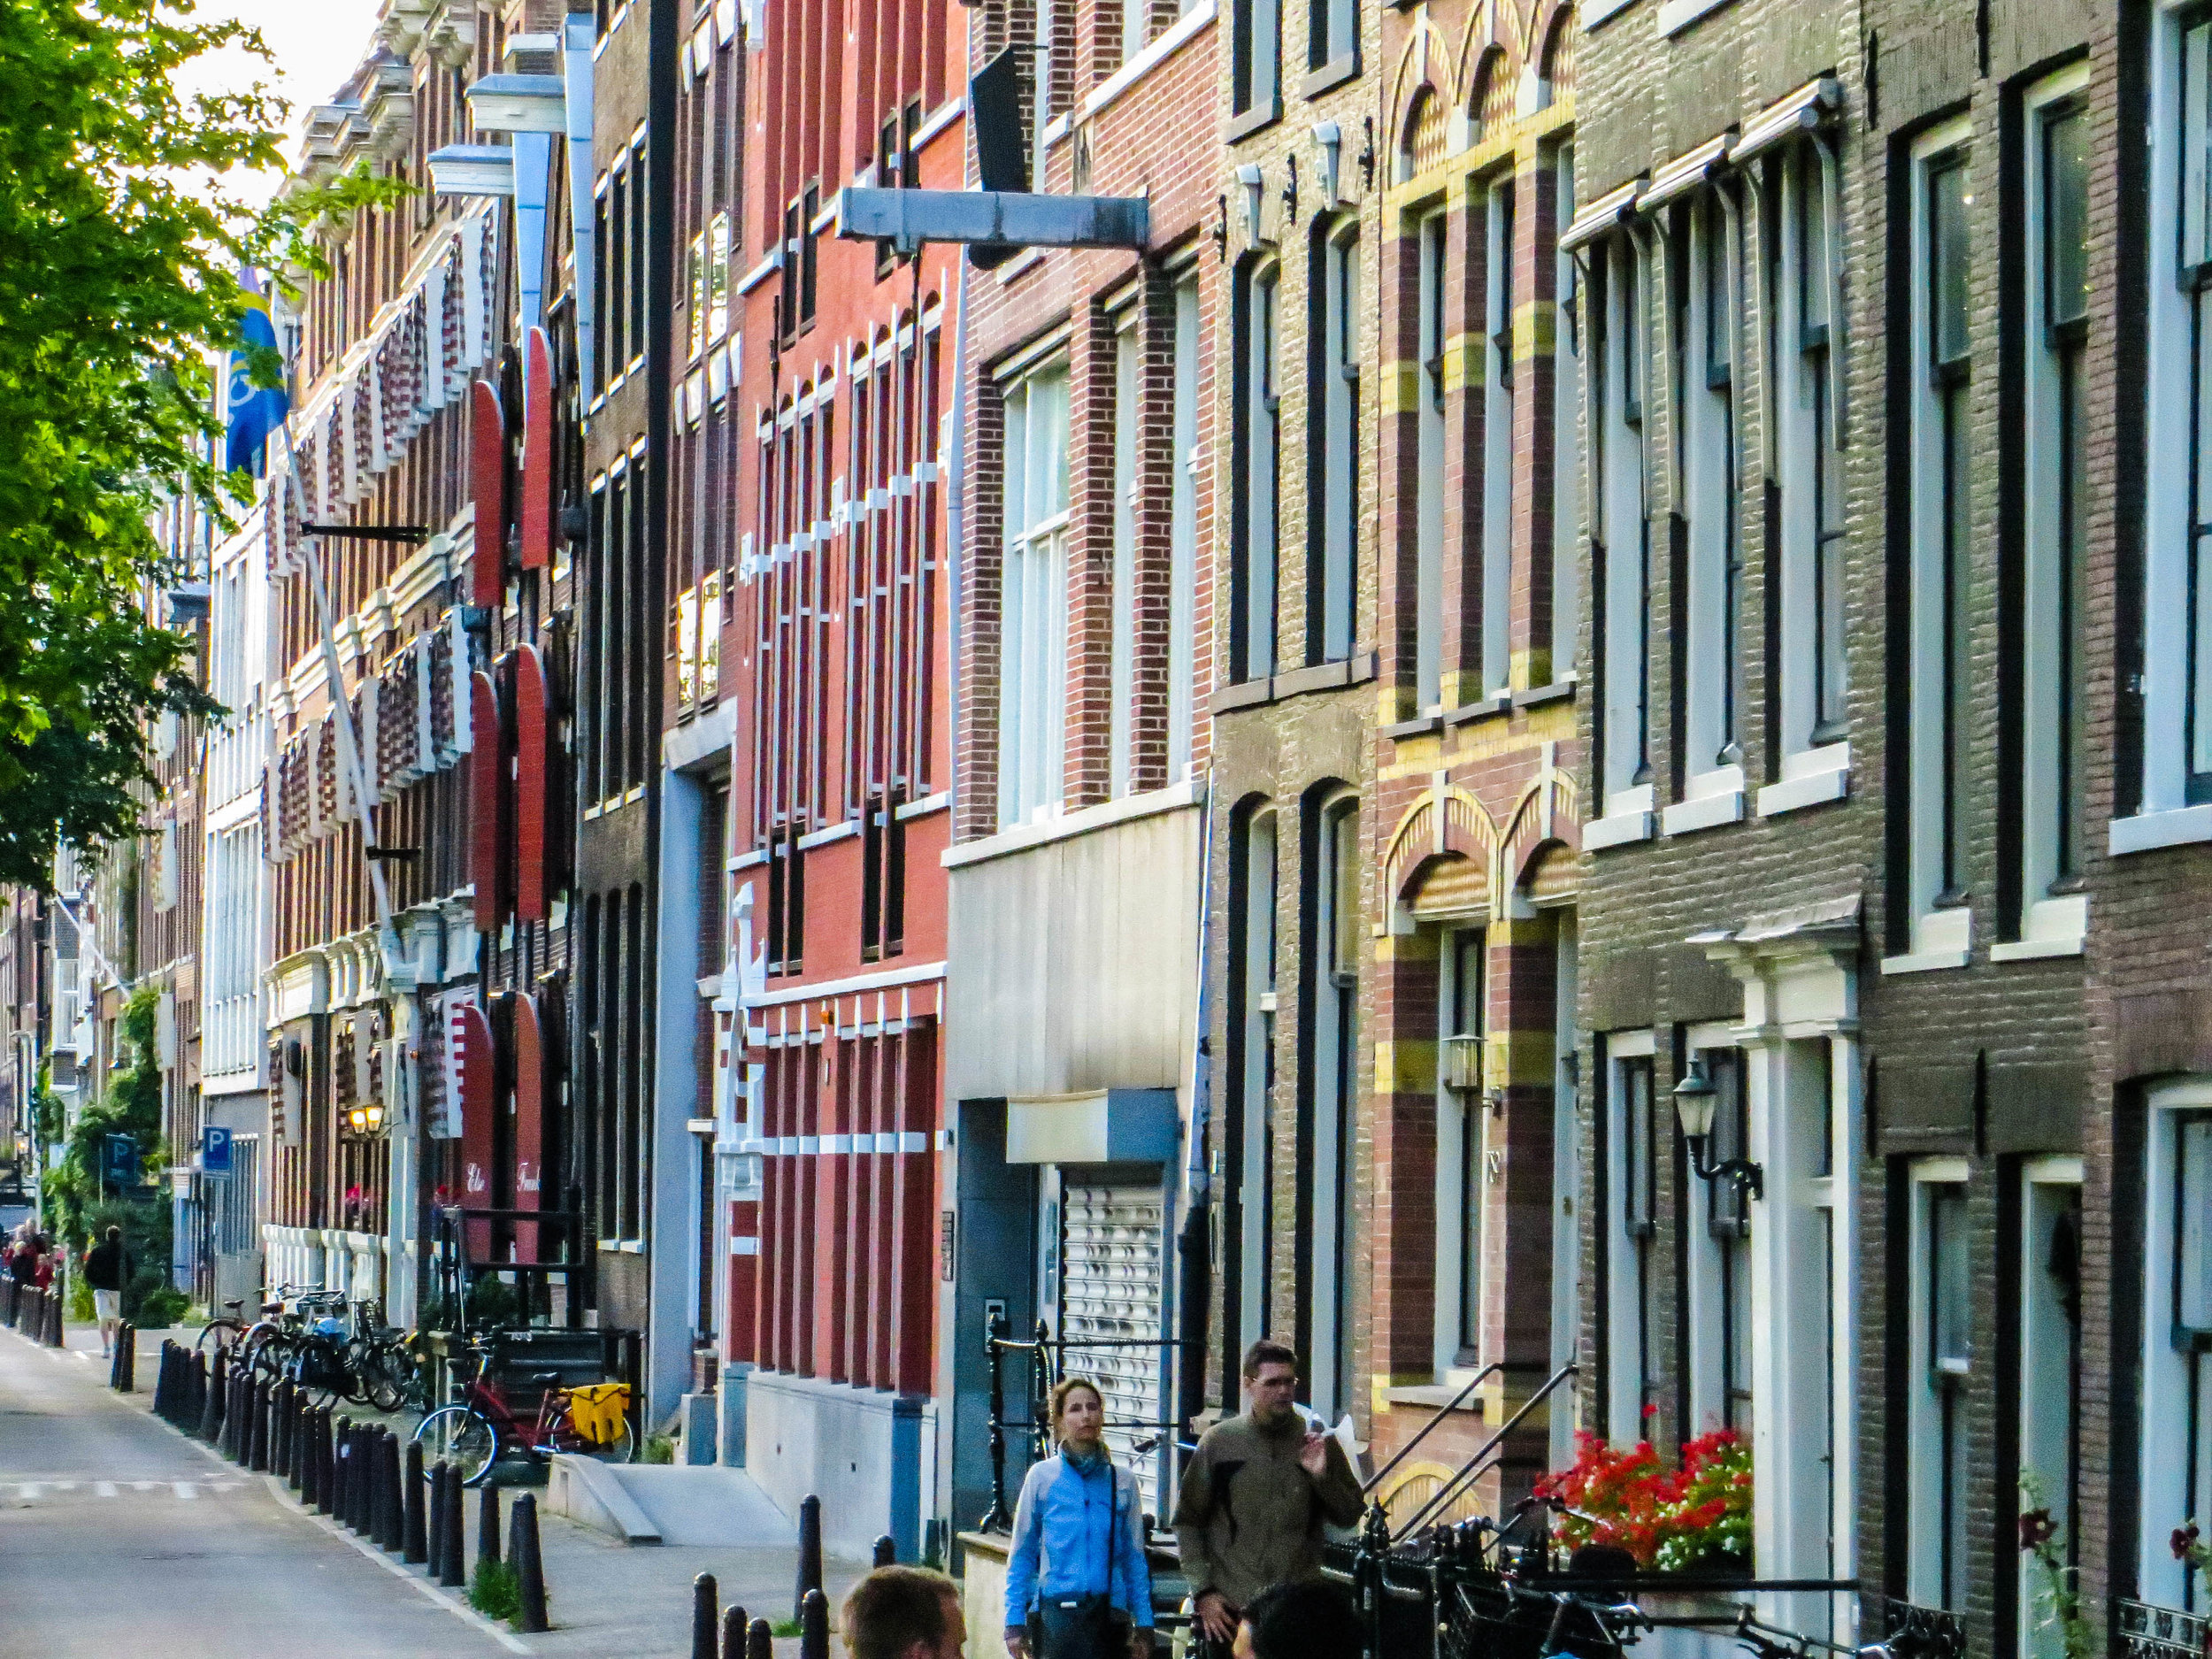 amsterdam-netherlands-street-photography-41.jpg